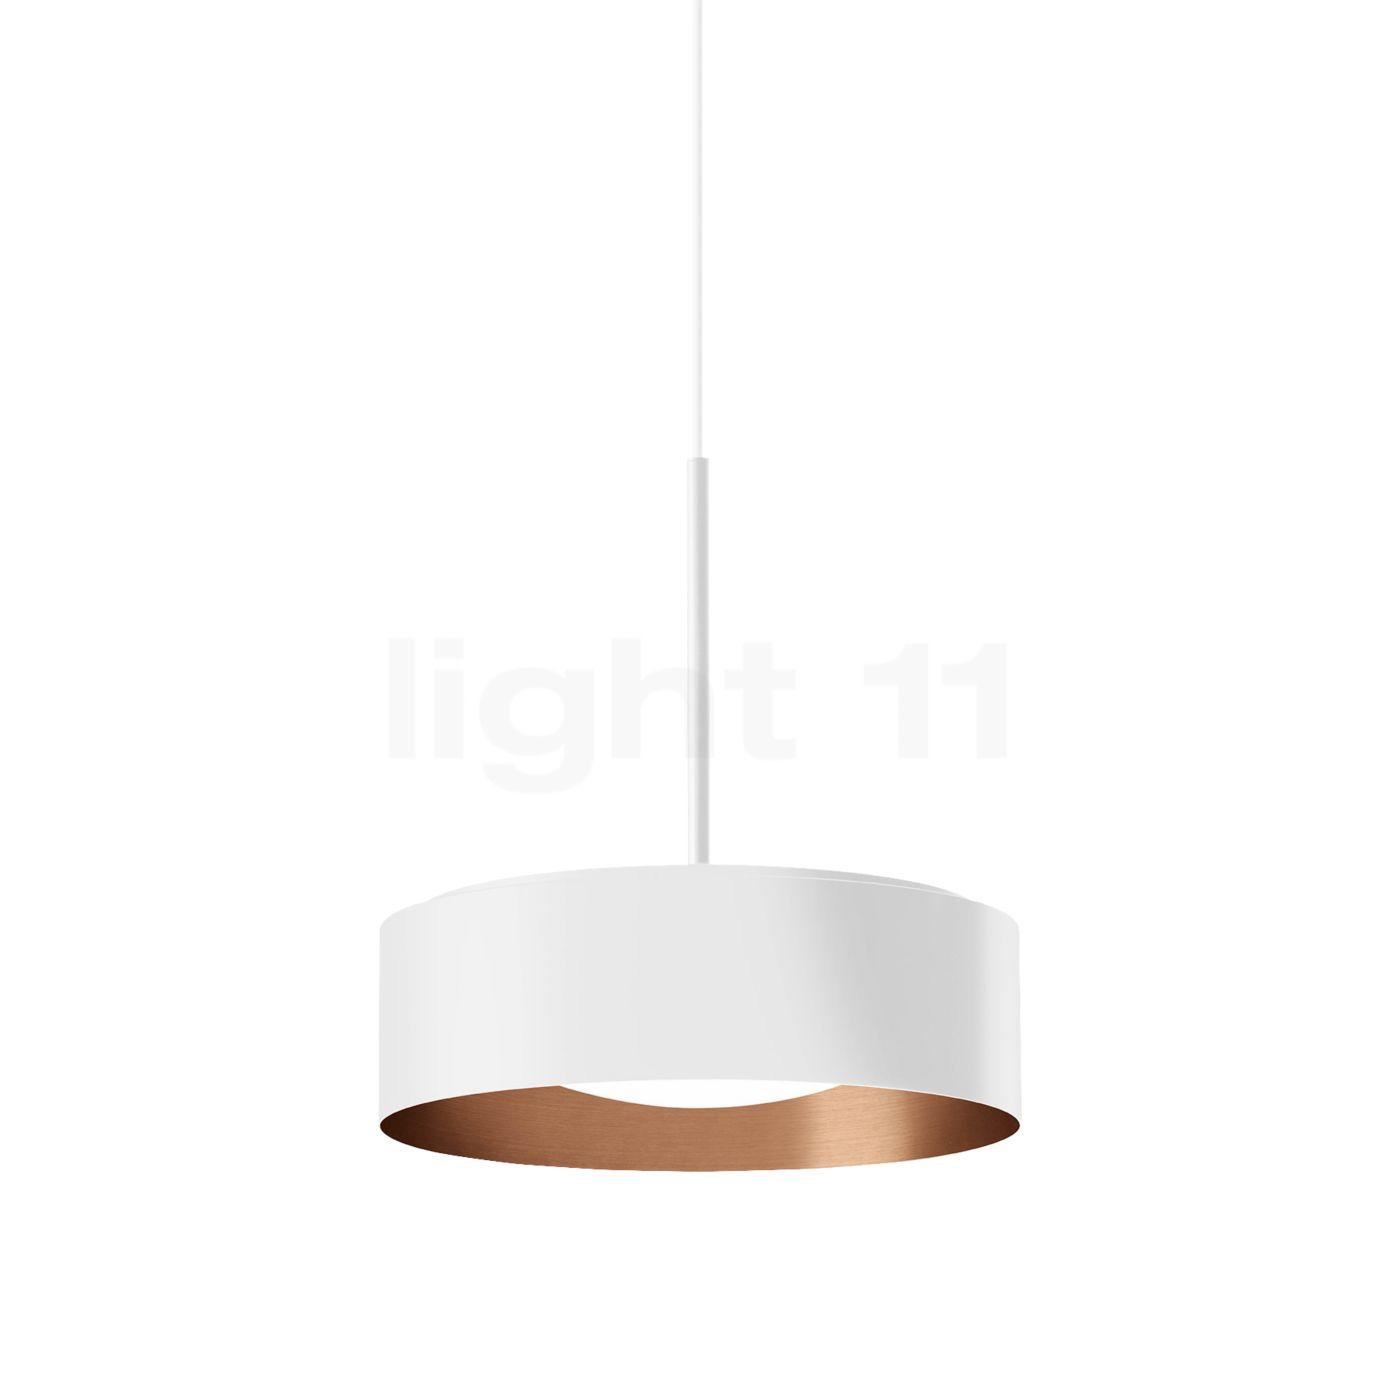 Super Bega Indoor Studio Line LED-Pendelleuchte rund kaufen bei light11.de KS12